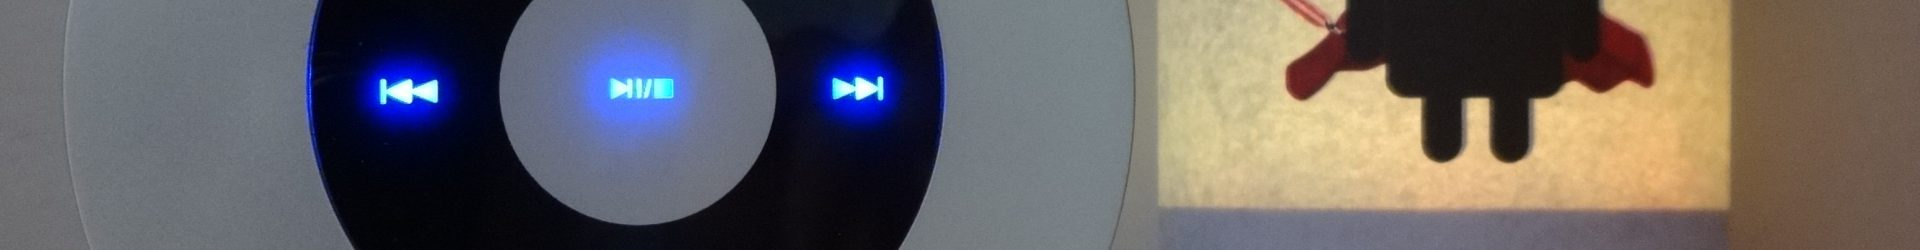 Recensione Chereeki A8: speaker Bluetooth di design. E che volume!